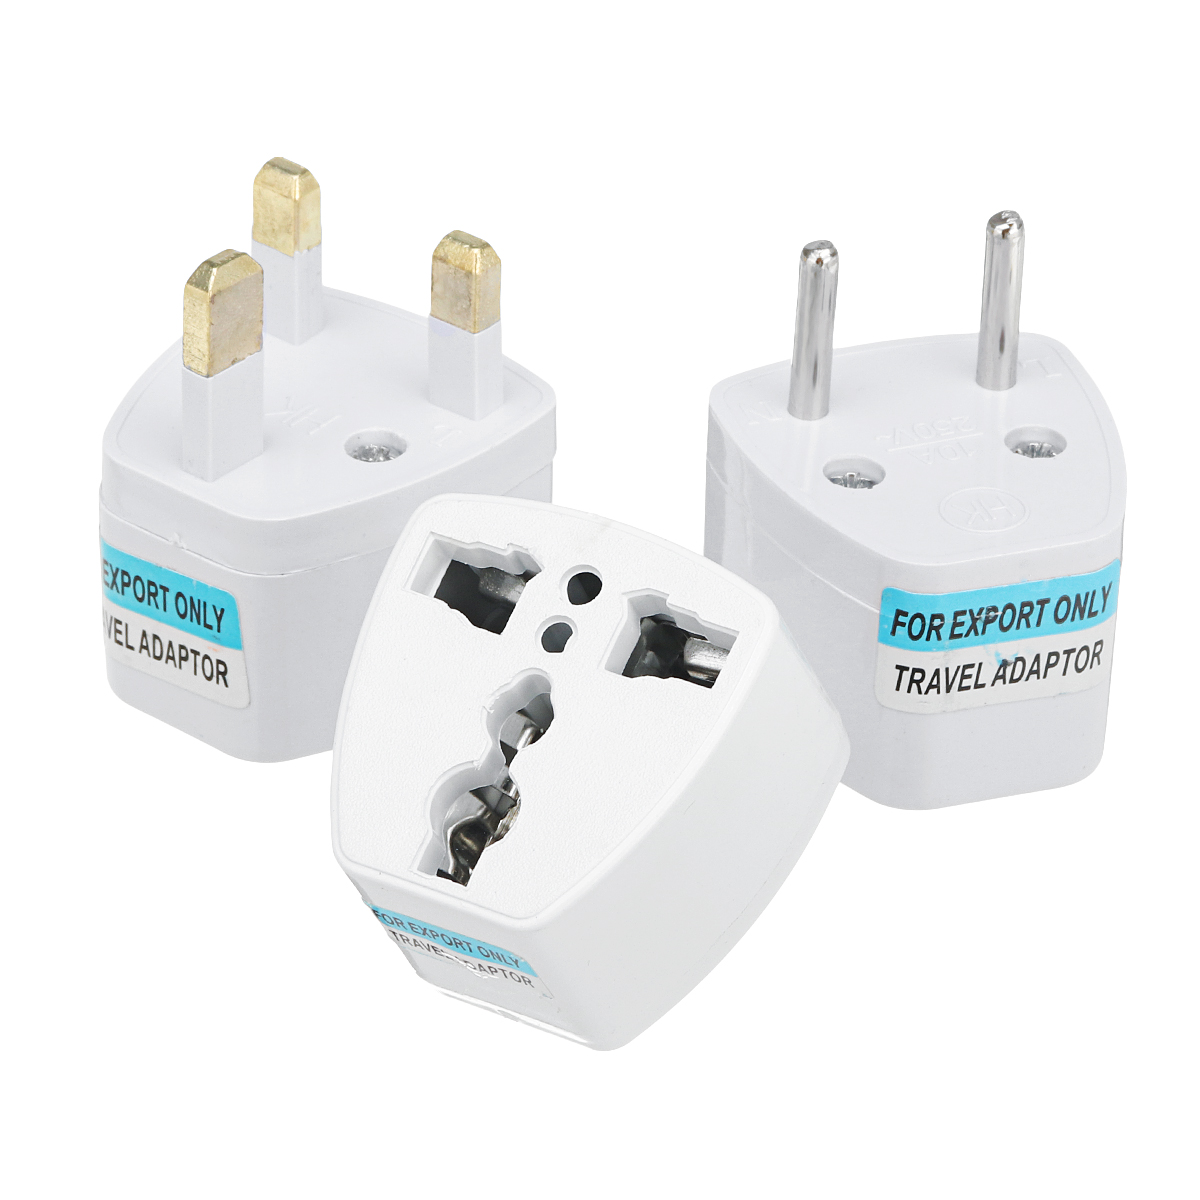 16-Kanal-Servomotorcontroller Robotercontroller-Servotreiber Für Arduino pz